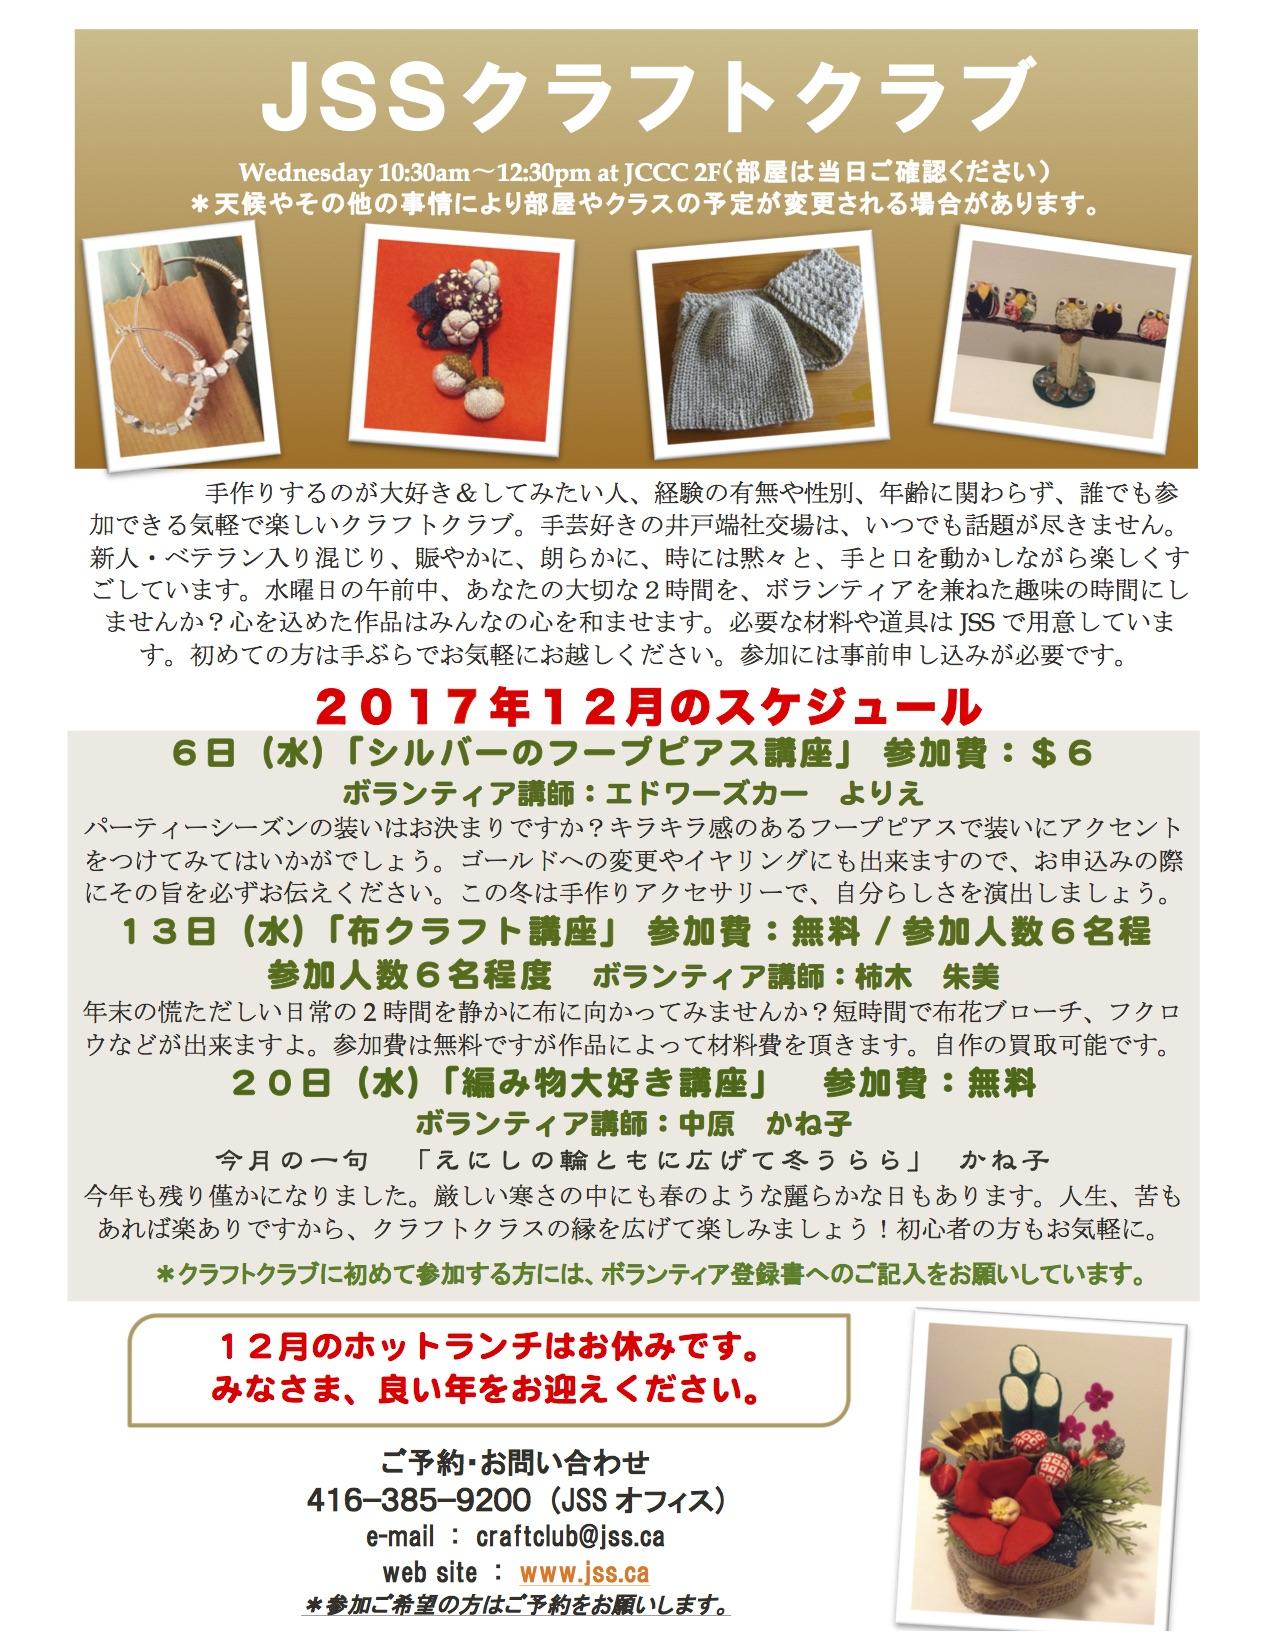 [:ja]JSS クラフトクラブ 12月の予定[:en]JSS Craft Club Schedule - December[:]